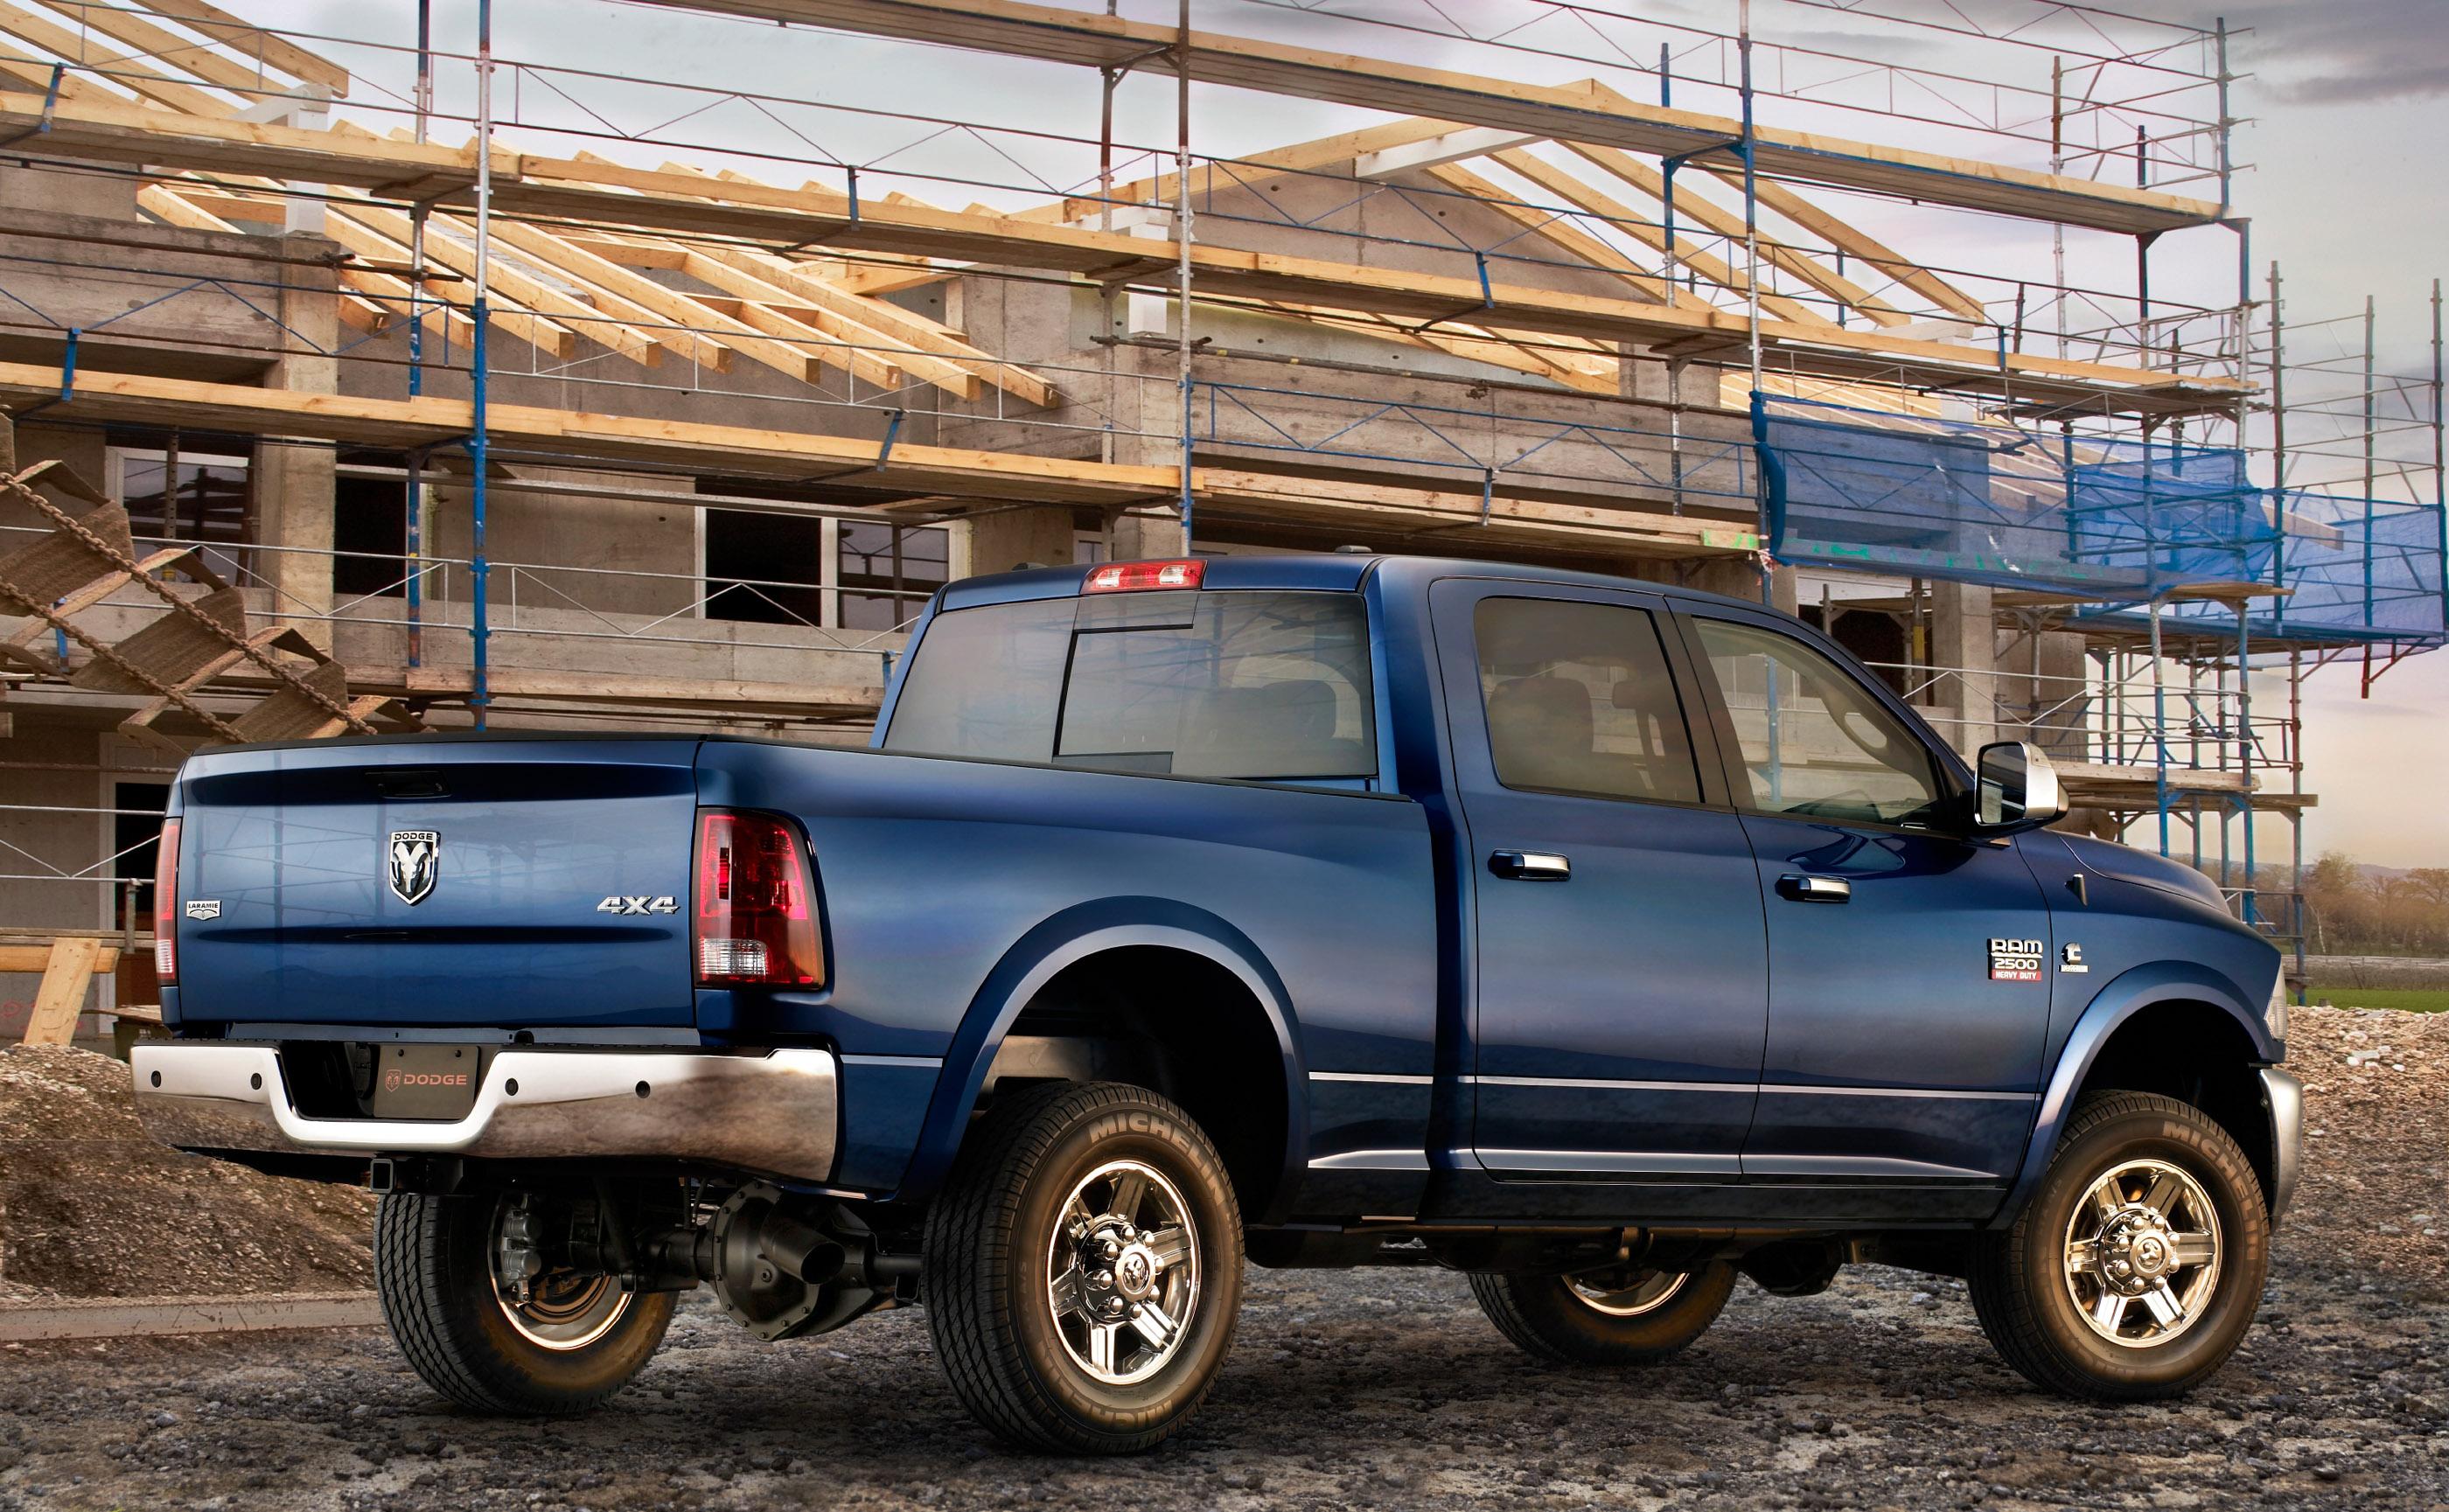 Dodge Ram Laramie Crew Cab on Dodge Ram 2500 Towing Mirrors